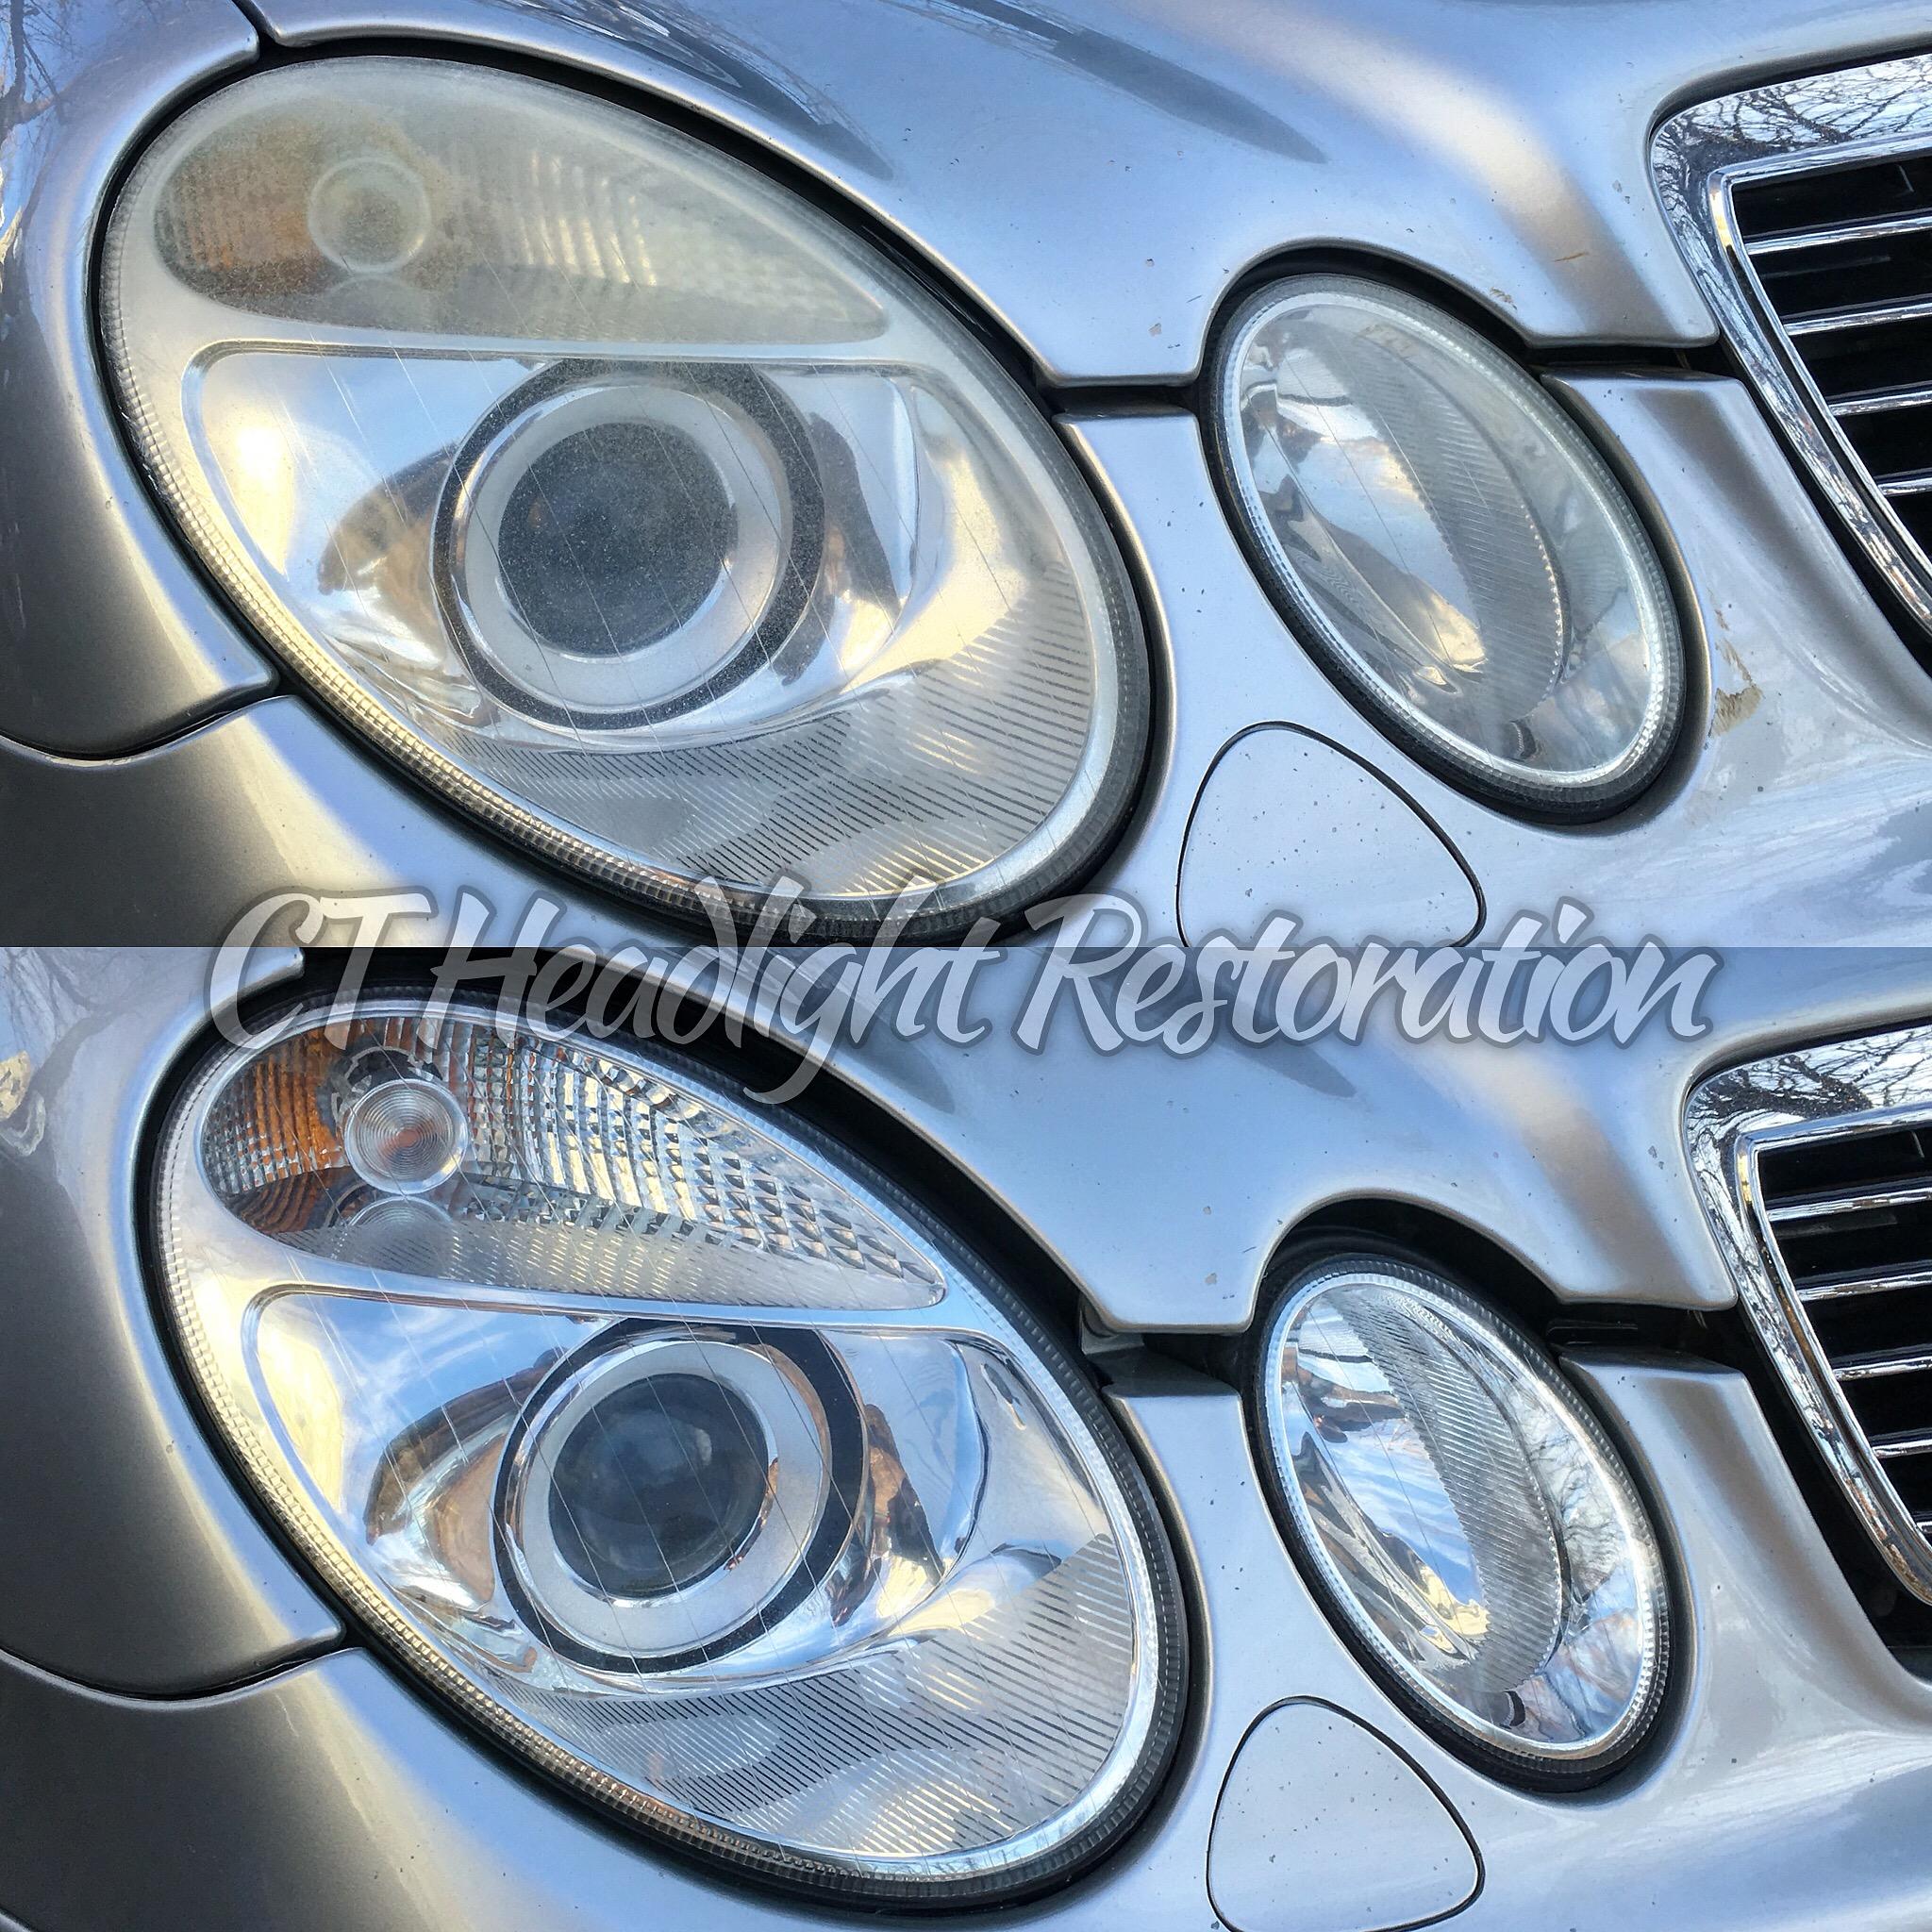 CT Headlight Restoration Mercedes E55 AMG.JPG